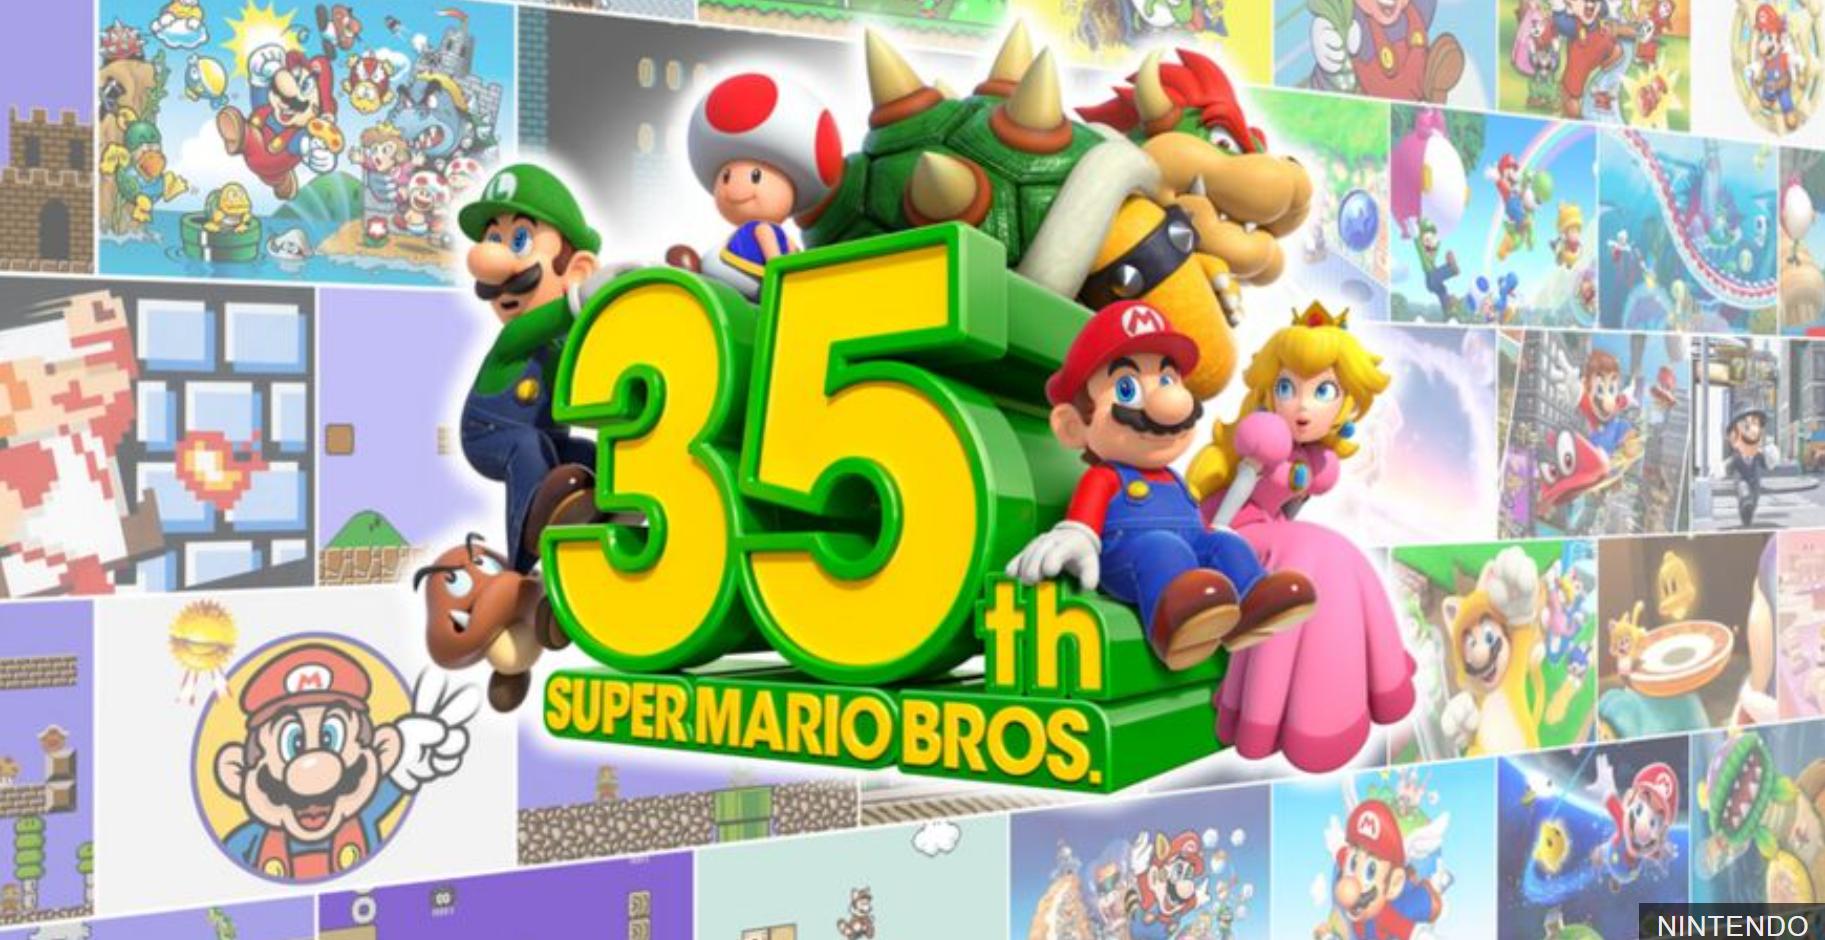 Super Mario is 35